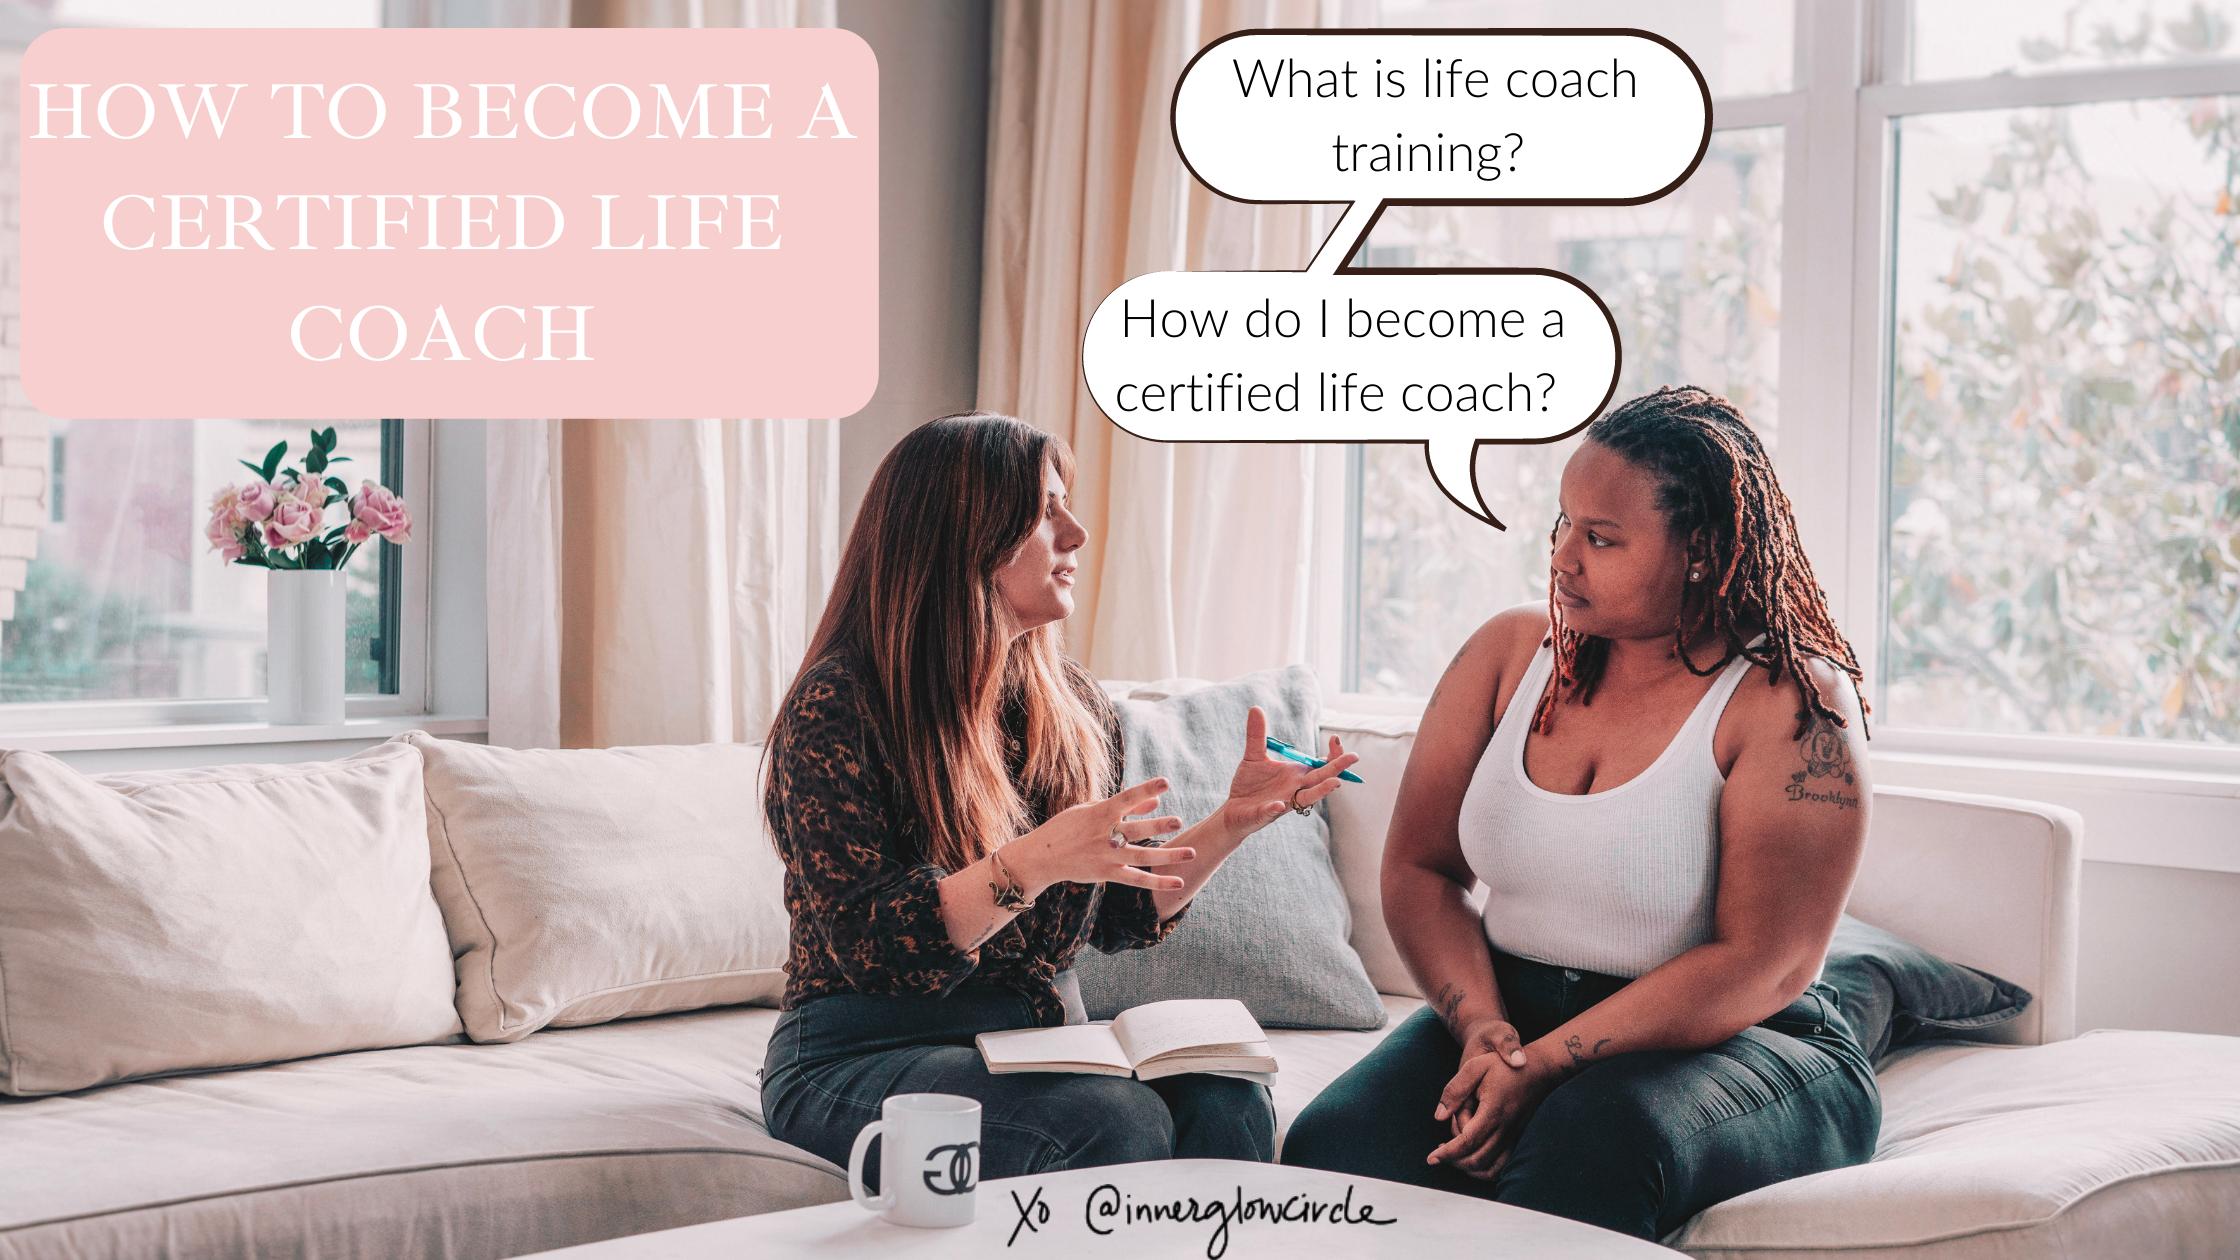 become a certified life coach through life coach training